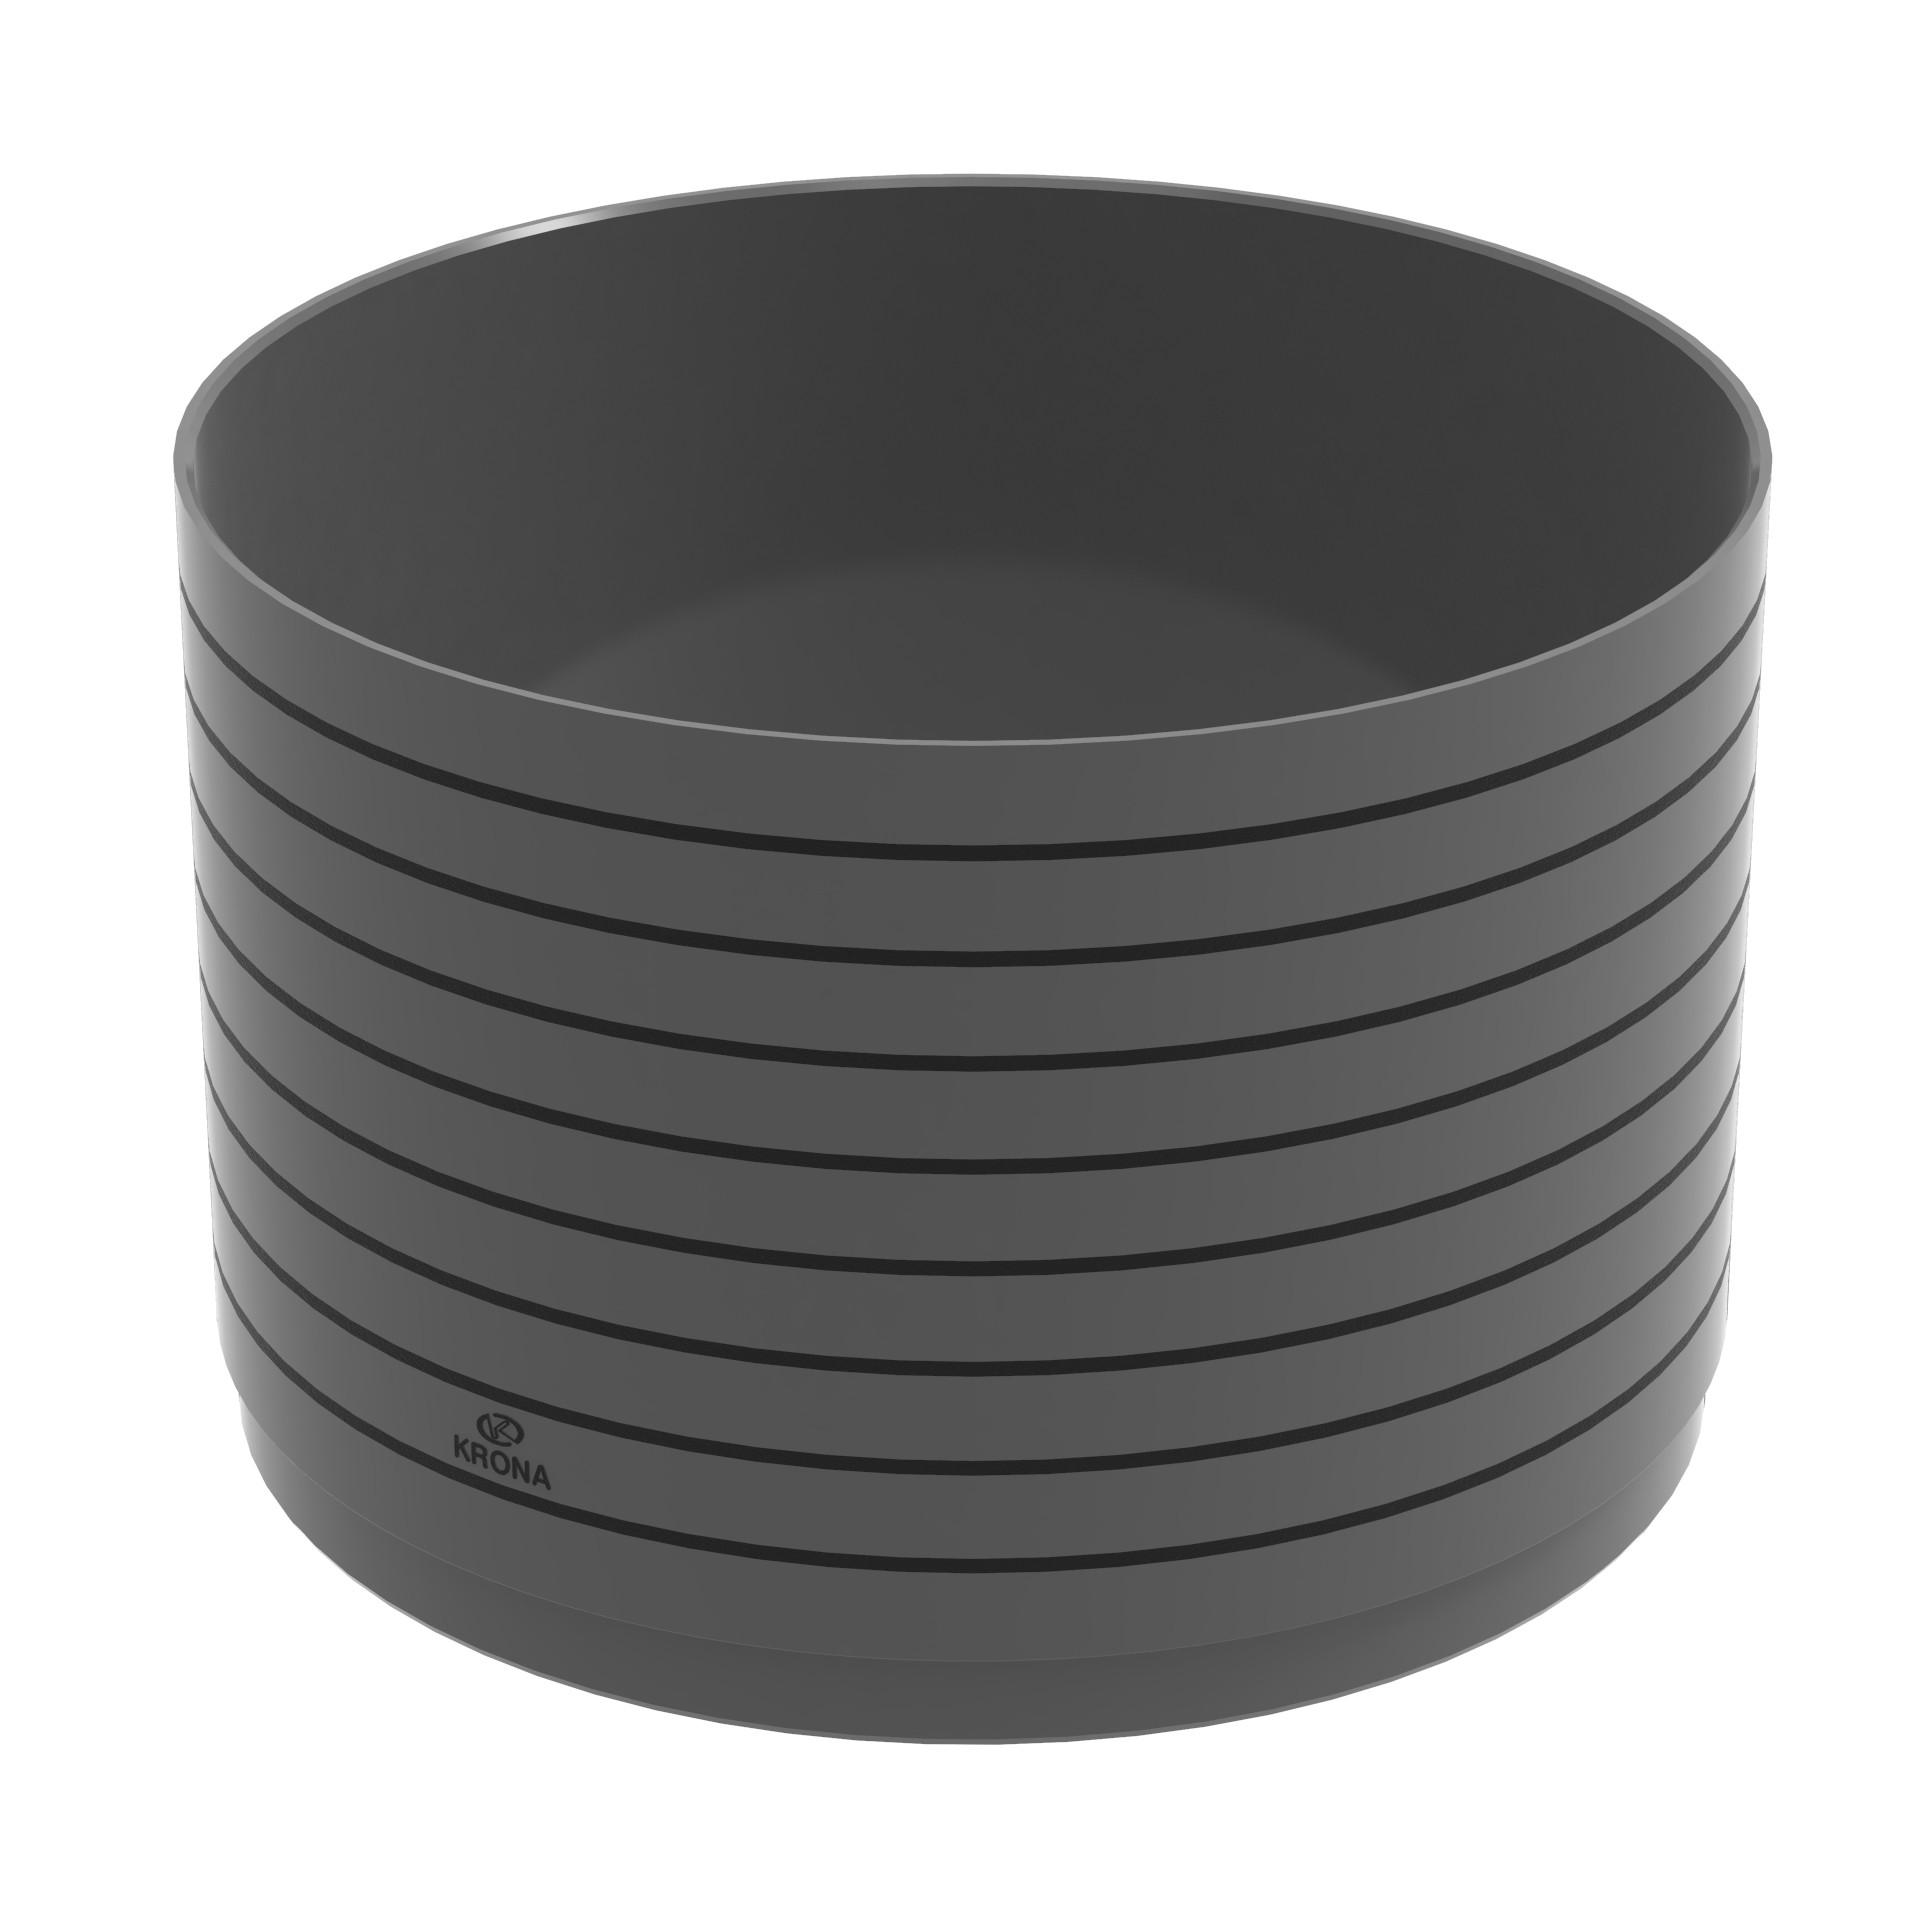 Prolongador de PVC para Caixa de Esgoto Cilindrico - Krona